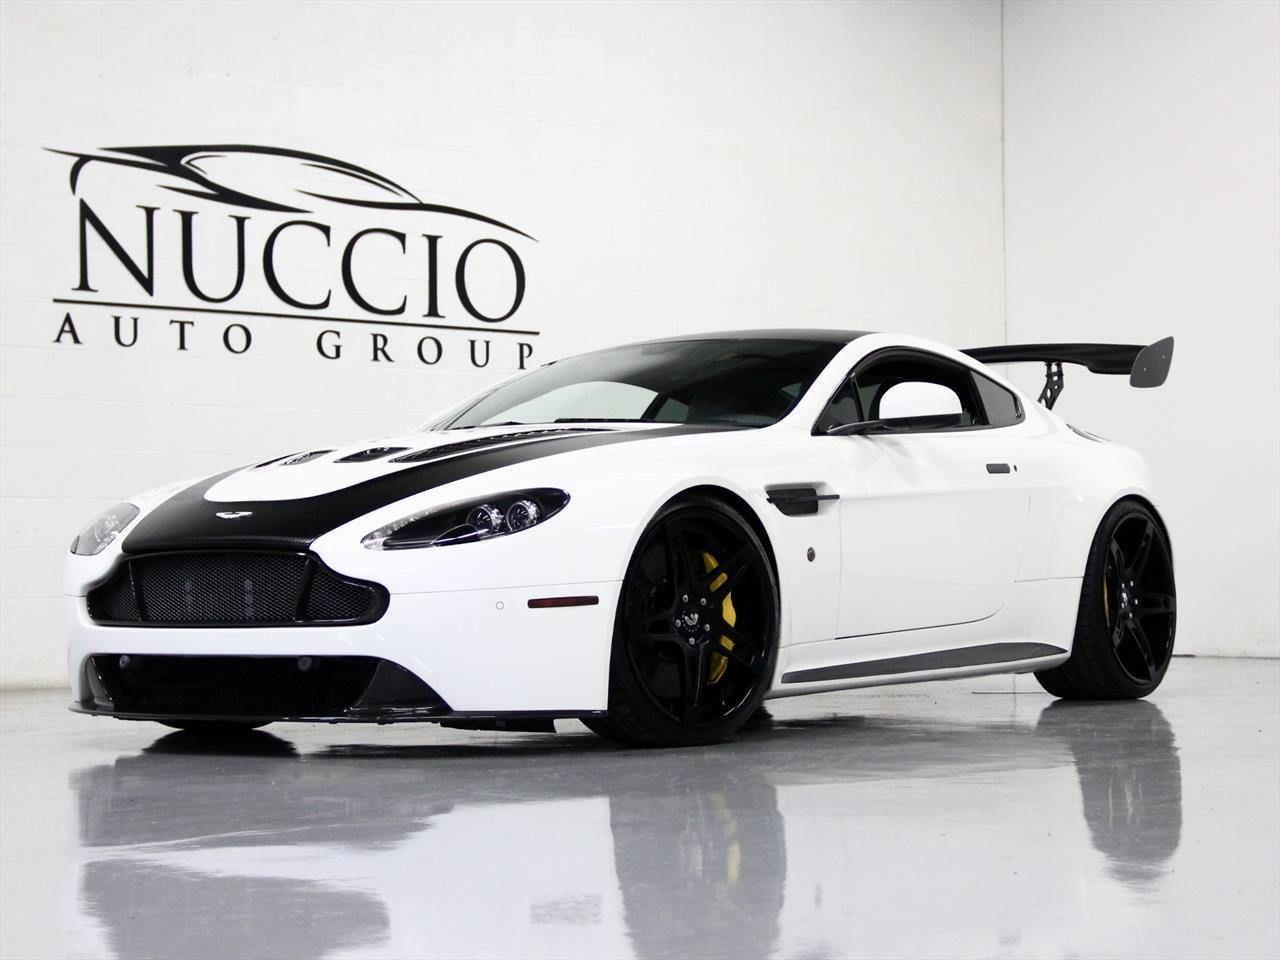 2015 Aston Martin Vantage S V12 Vantage S V12 Stratus White Dk Mocha 5k Miles Carbon Wing Splitter Grill